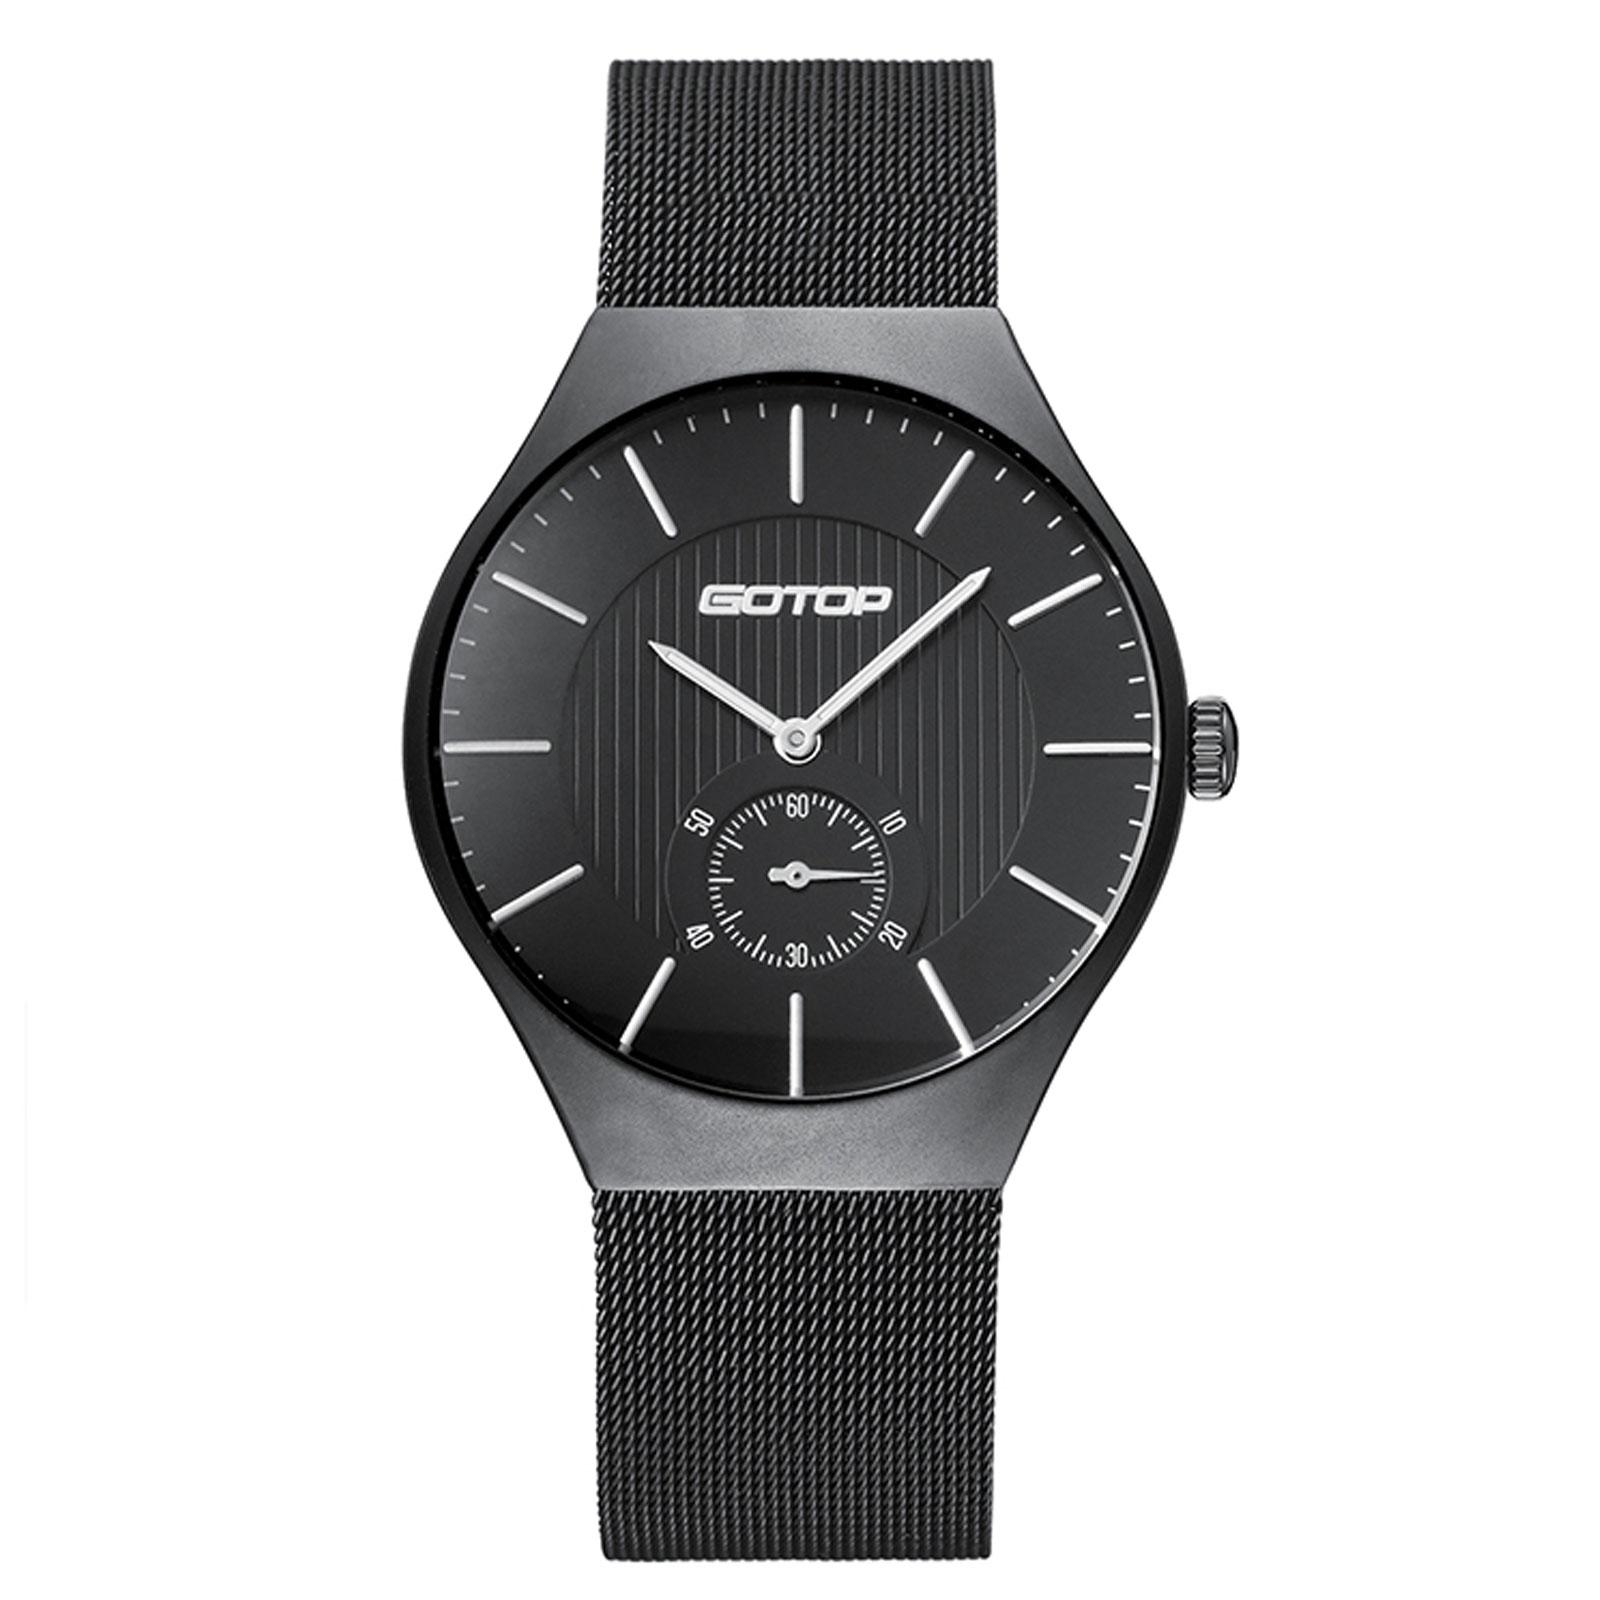 Matt Black Stainless Steel Men's Watch